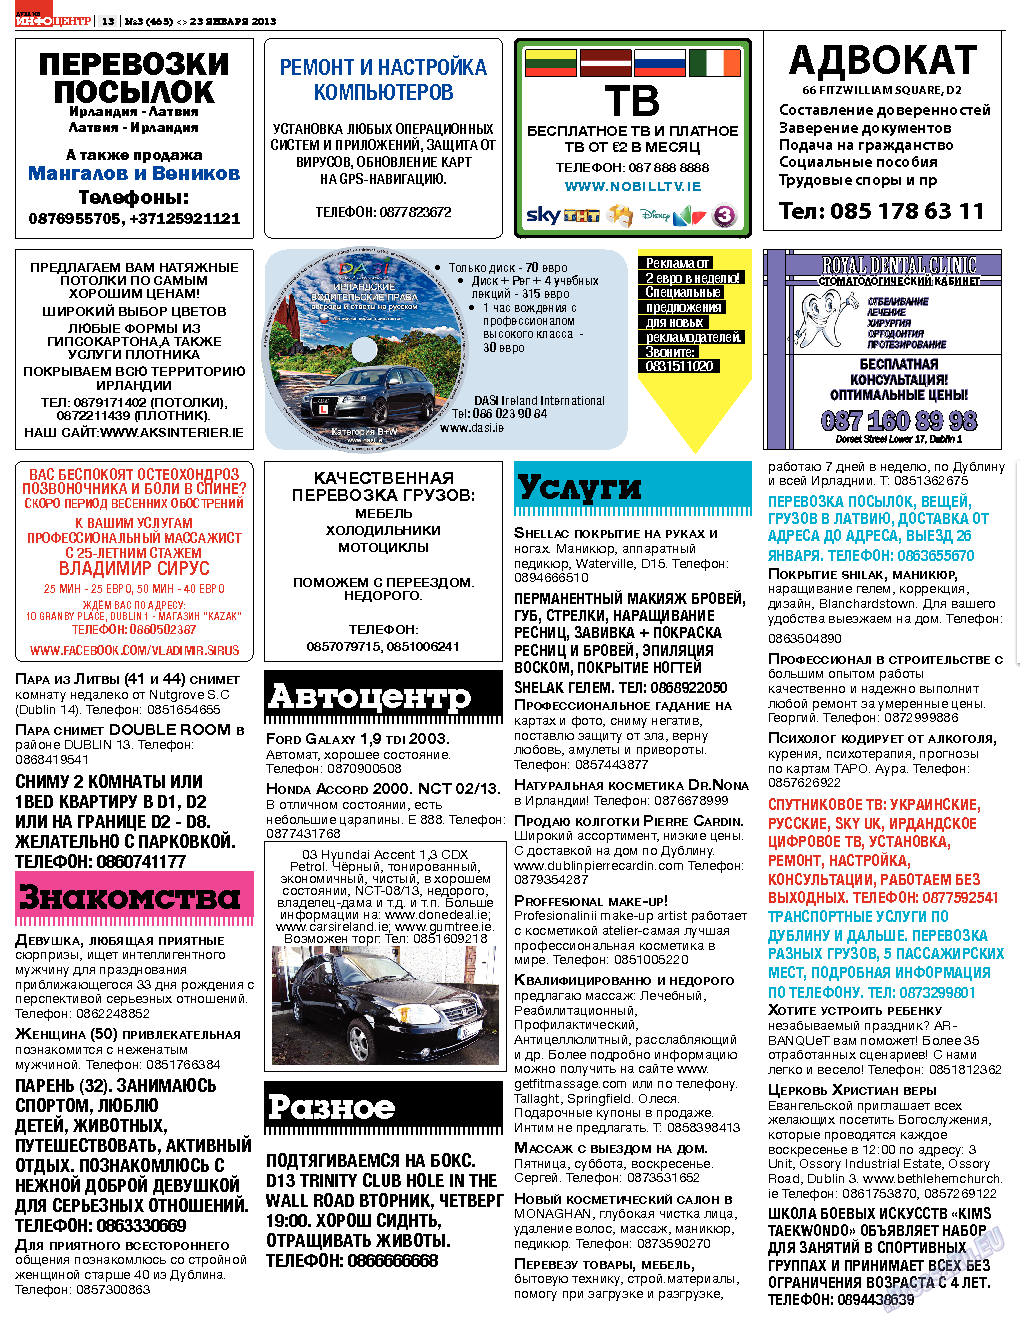 Дублин инфоцентр (газета). 2013 год, номер 3, стр. 13